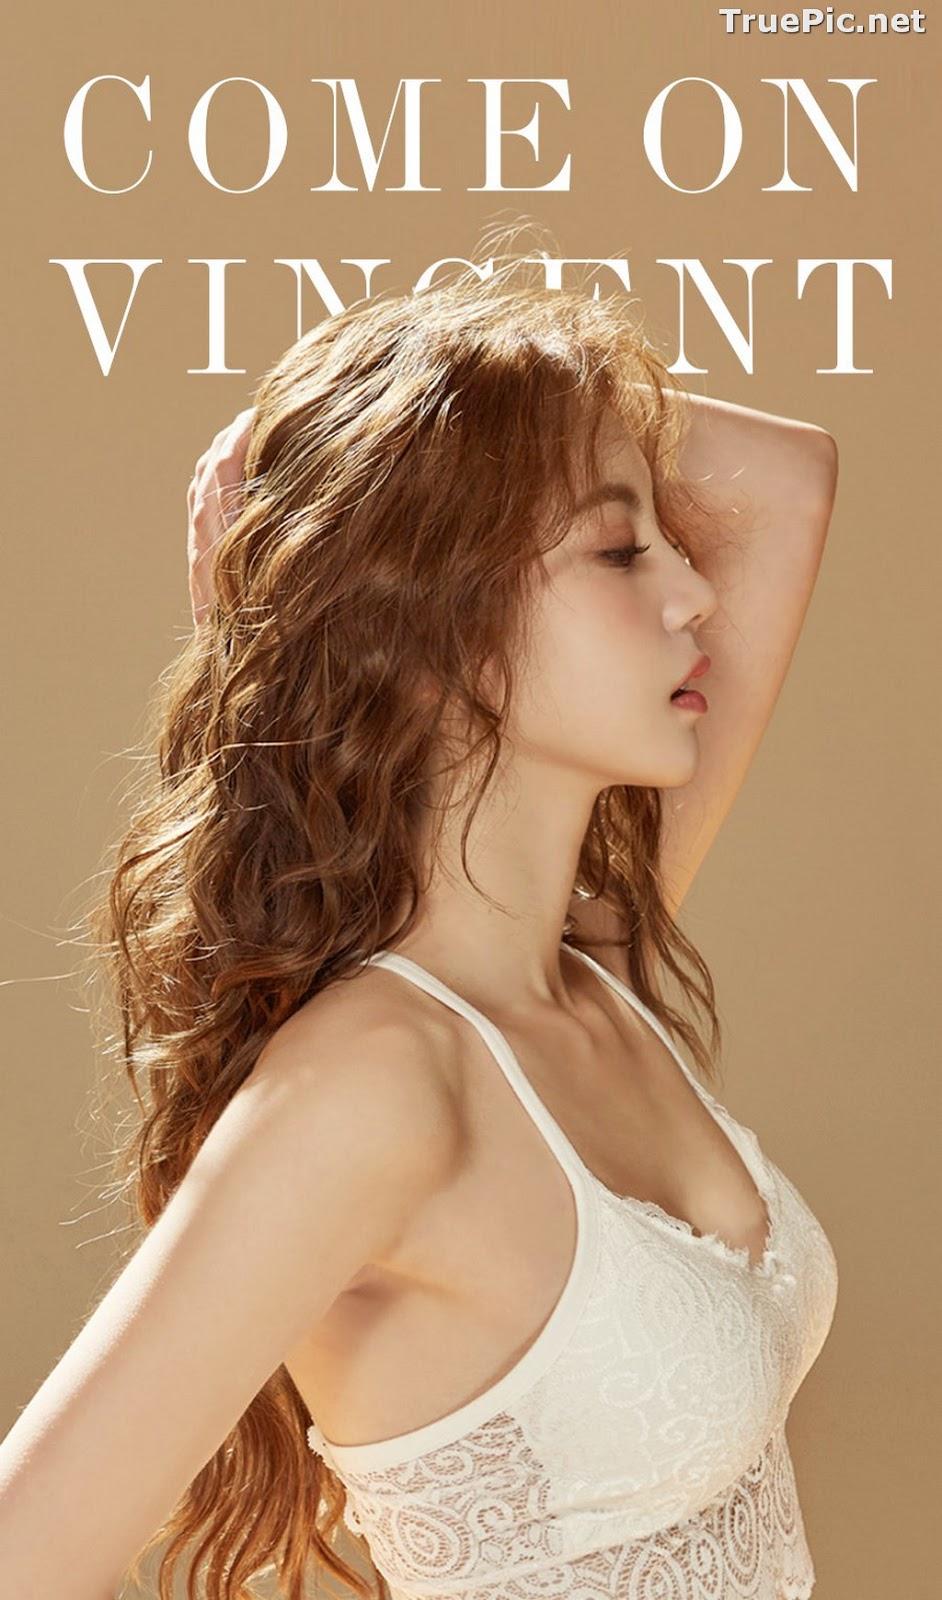 Image Korean Fashion Model – Lee Chae Eun (이채은) – Come On Vincent Lingerie #7 - TruePic.net - Picture-1